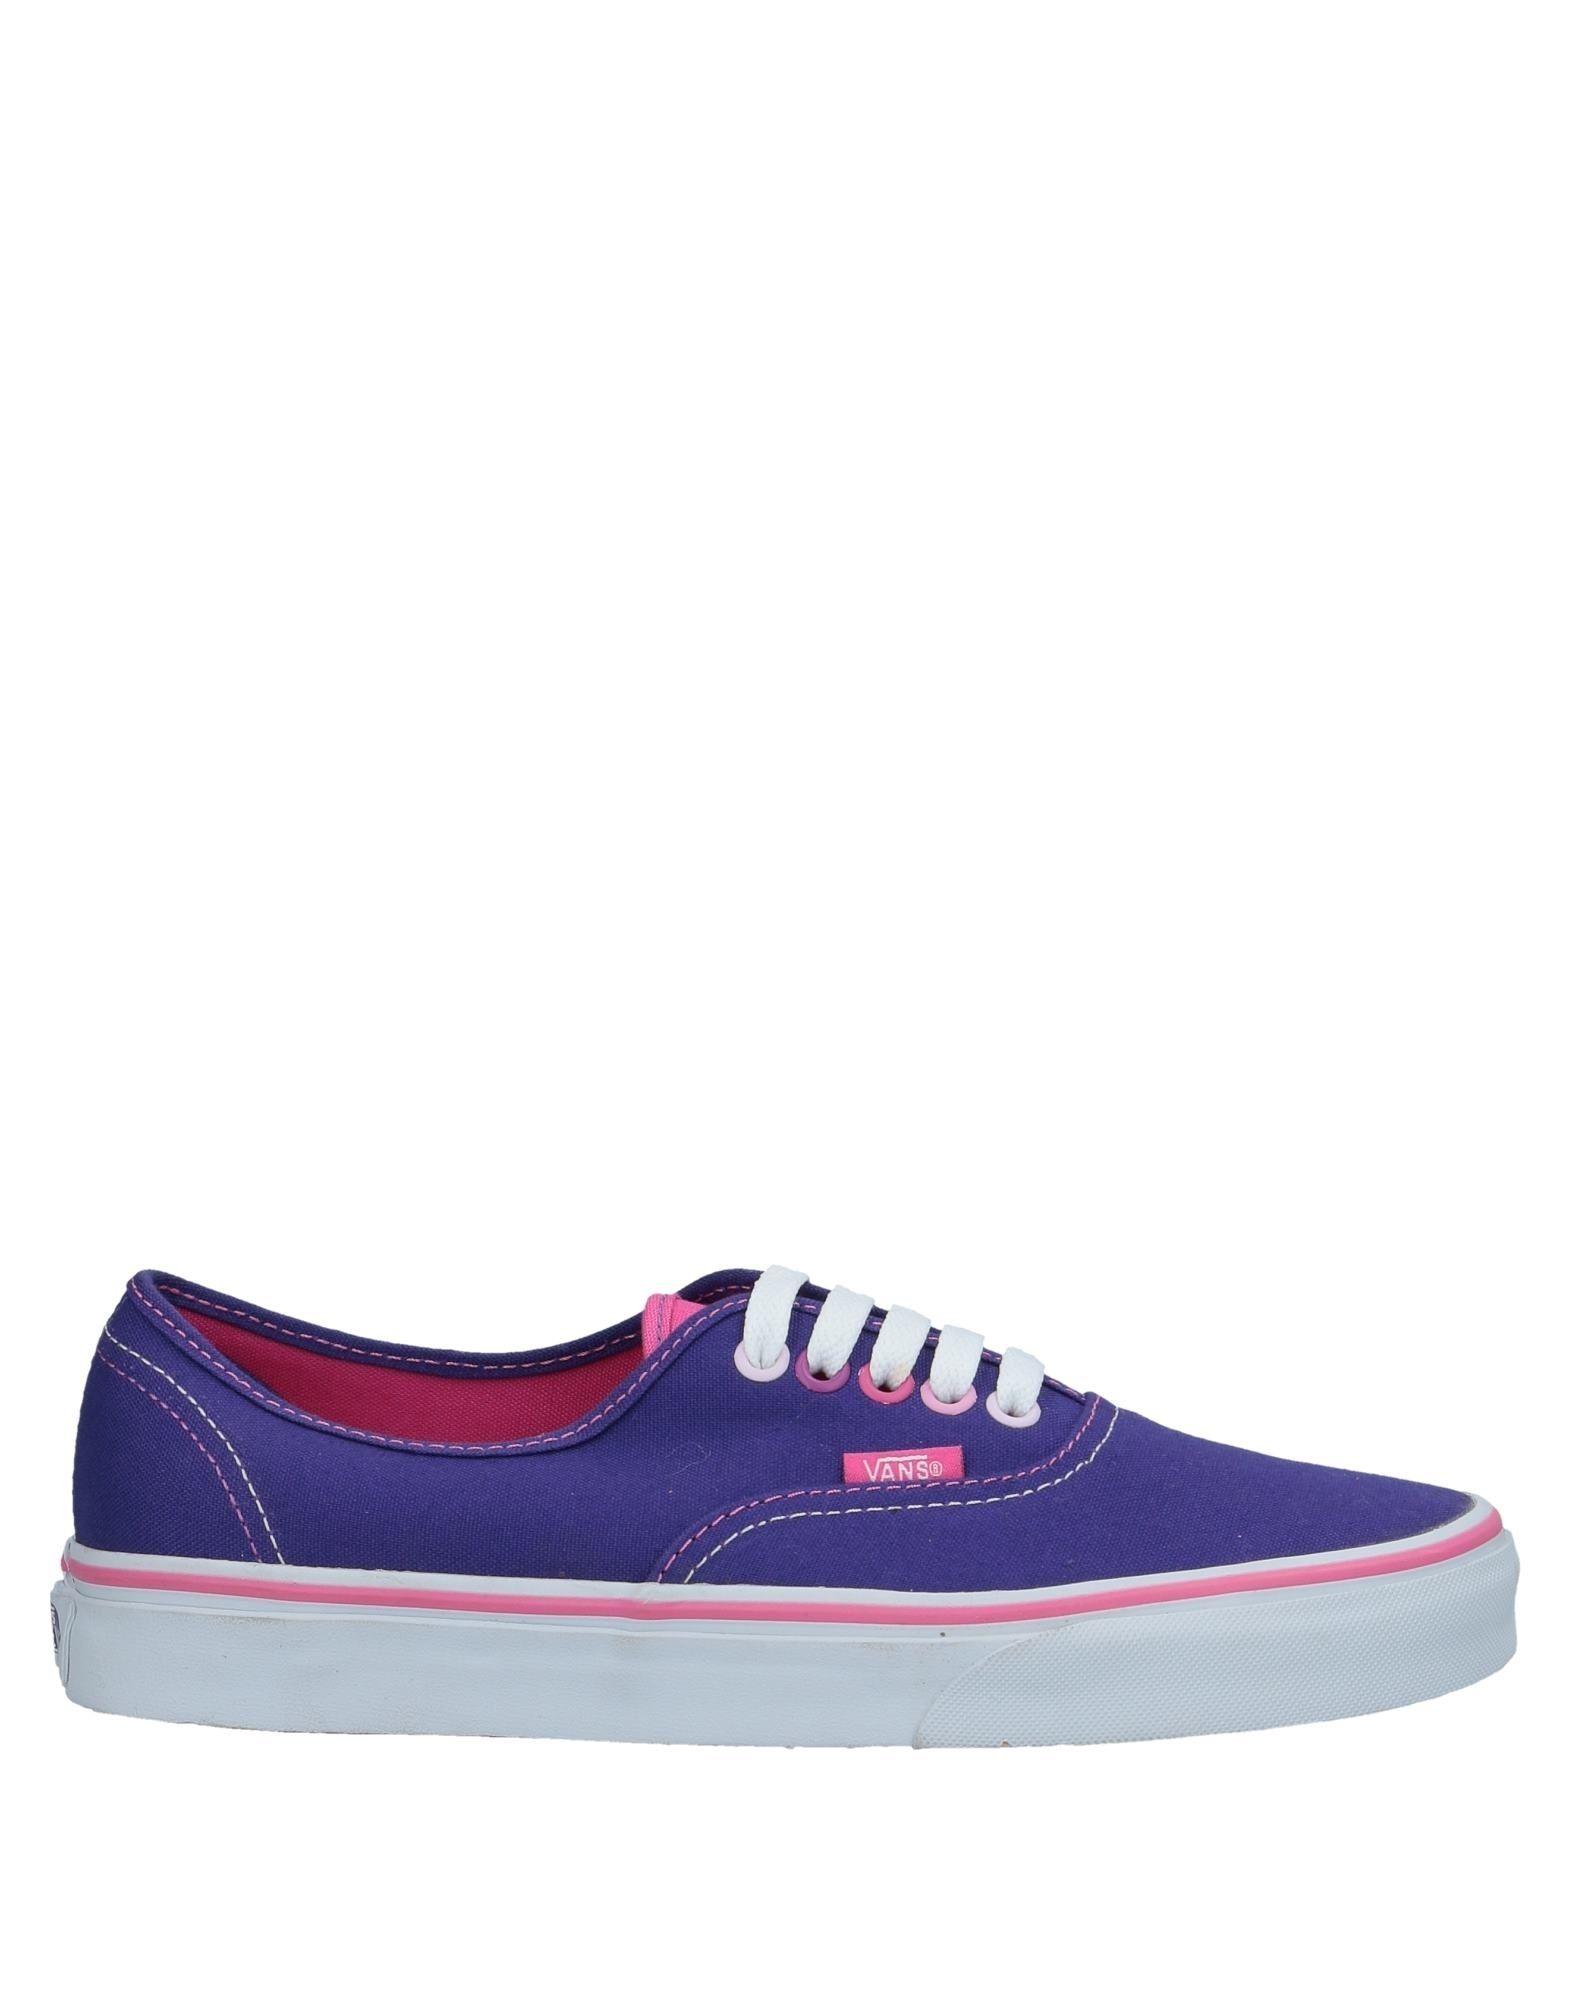 Vans Sneakers Damen  11527967WS Gute Qualität beliebte Schuhe